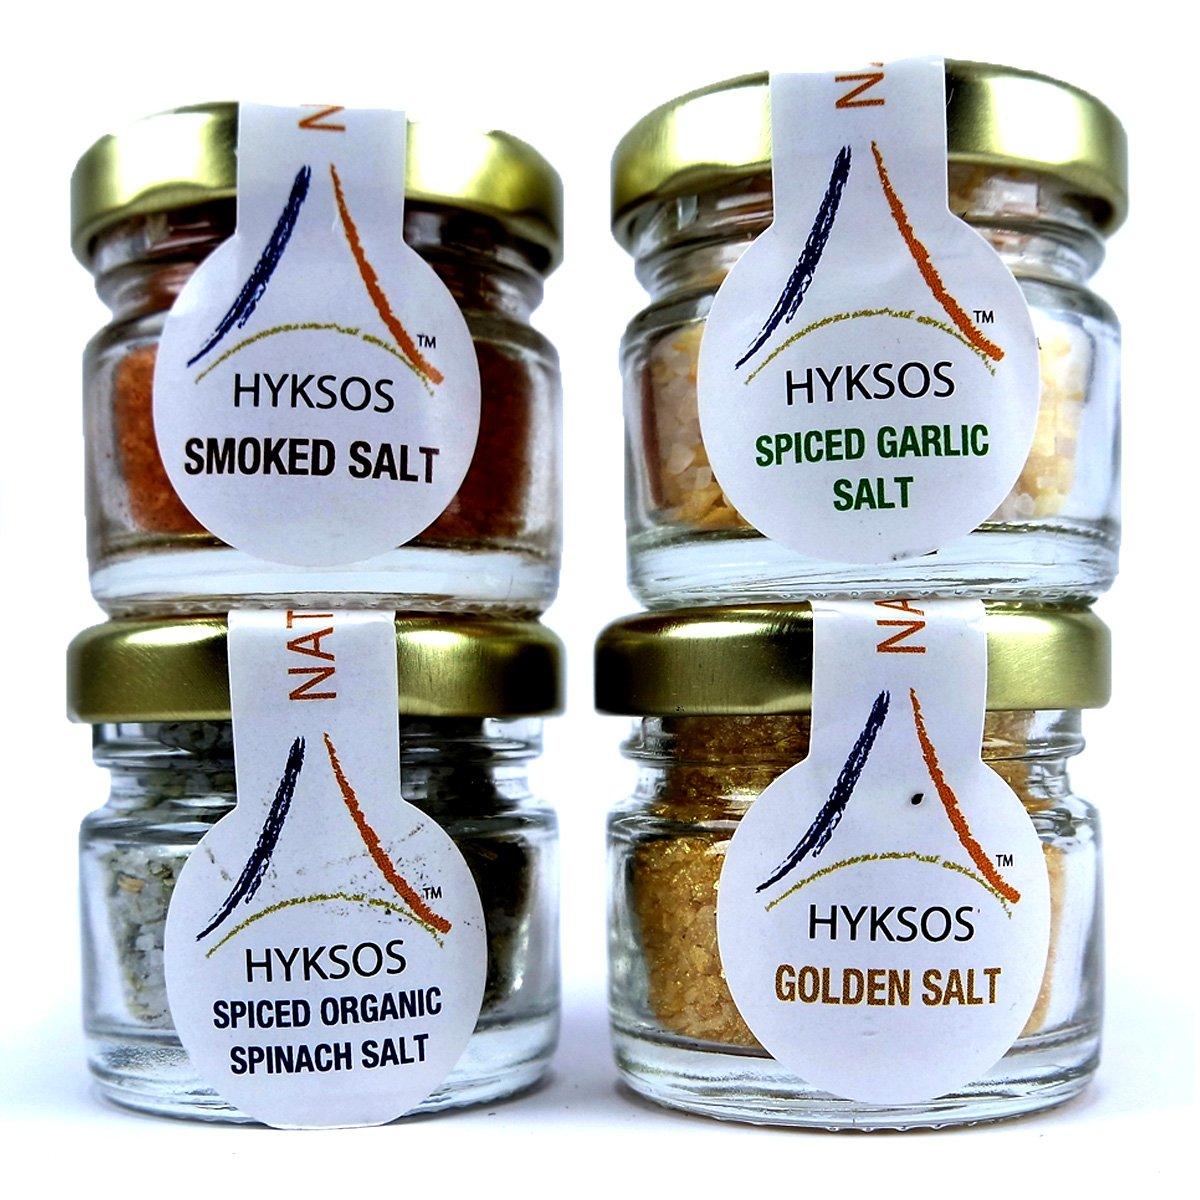 Hyksos Dead Sea Edible Flavored Coarse Salt Set – Smoked Salt & Spiced Garlic Salt & Spiced Organic Spinach Salt & Golden Salt 1.2oz x 4 Jars